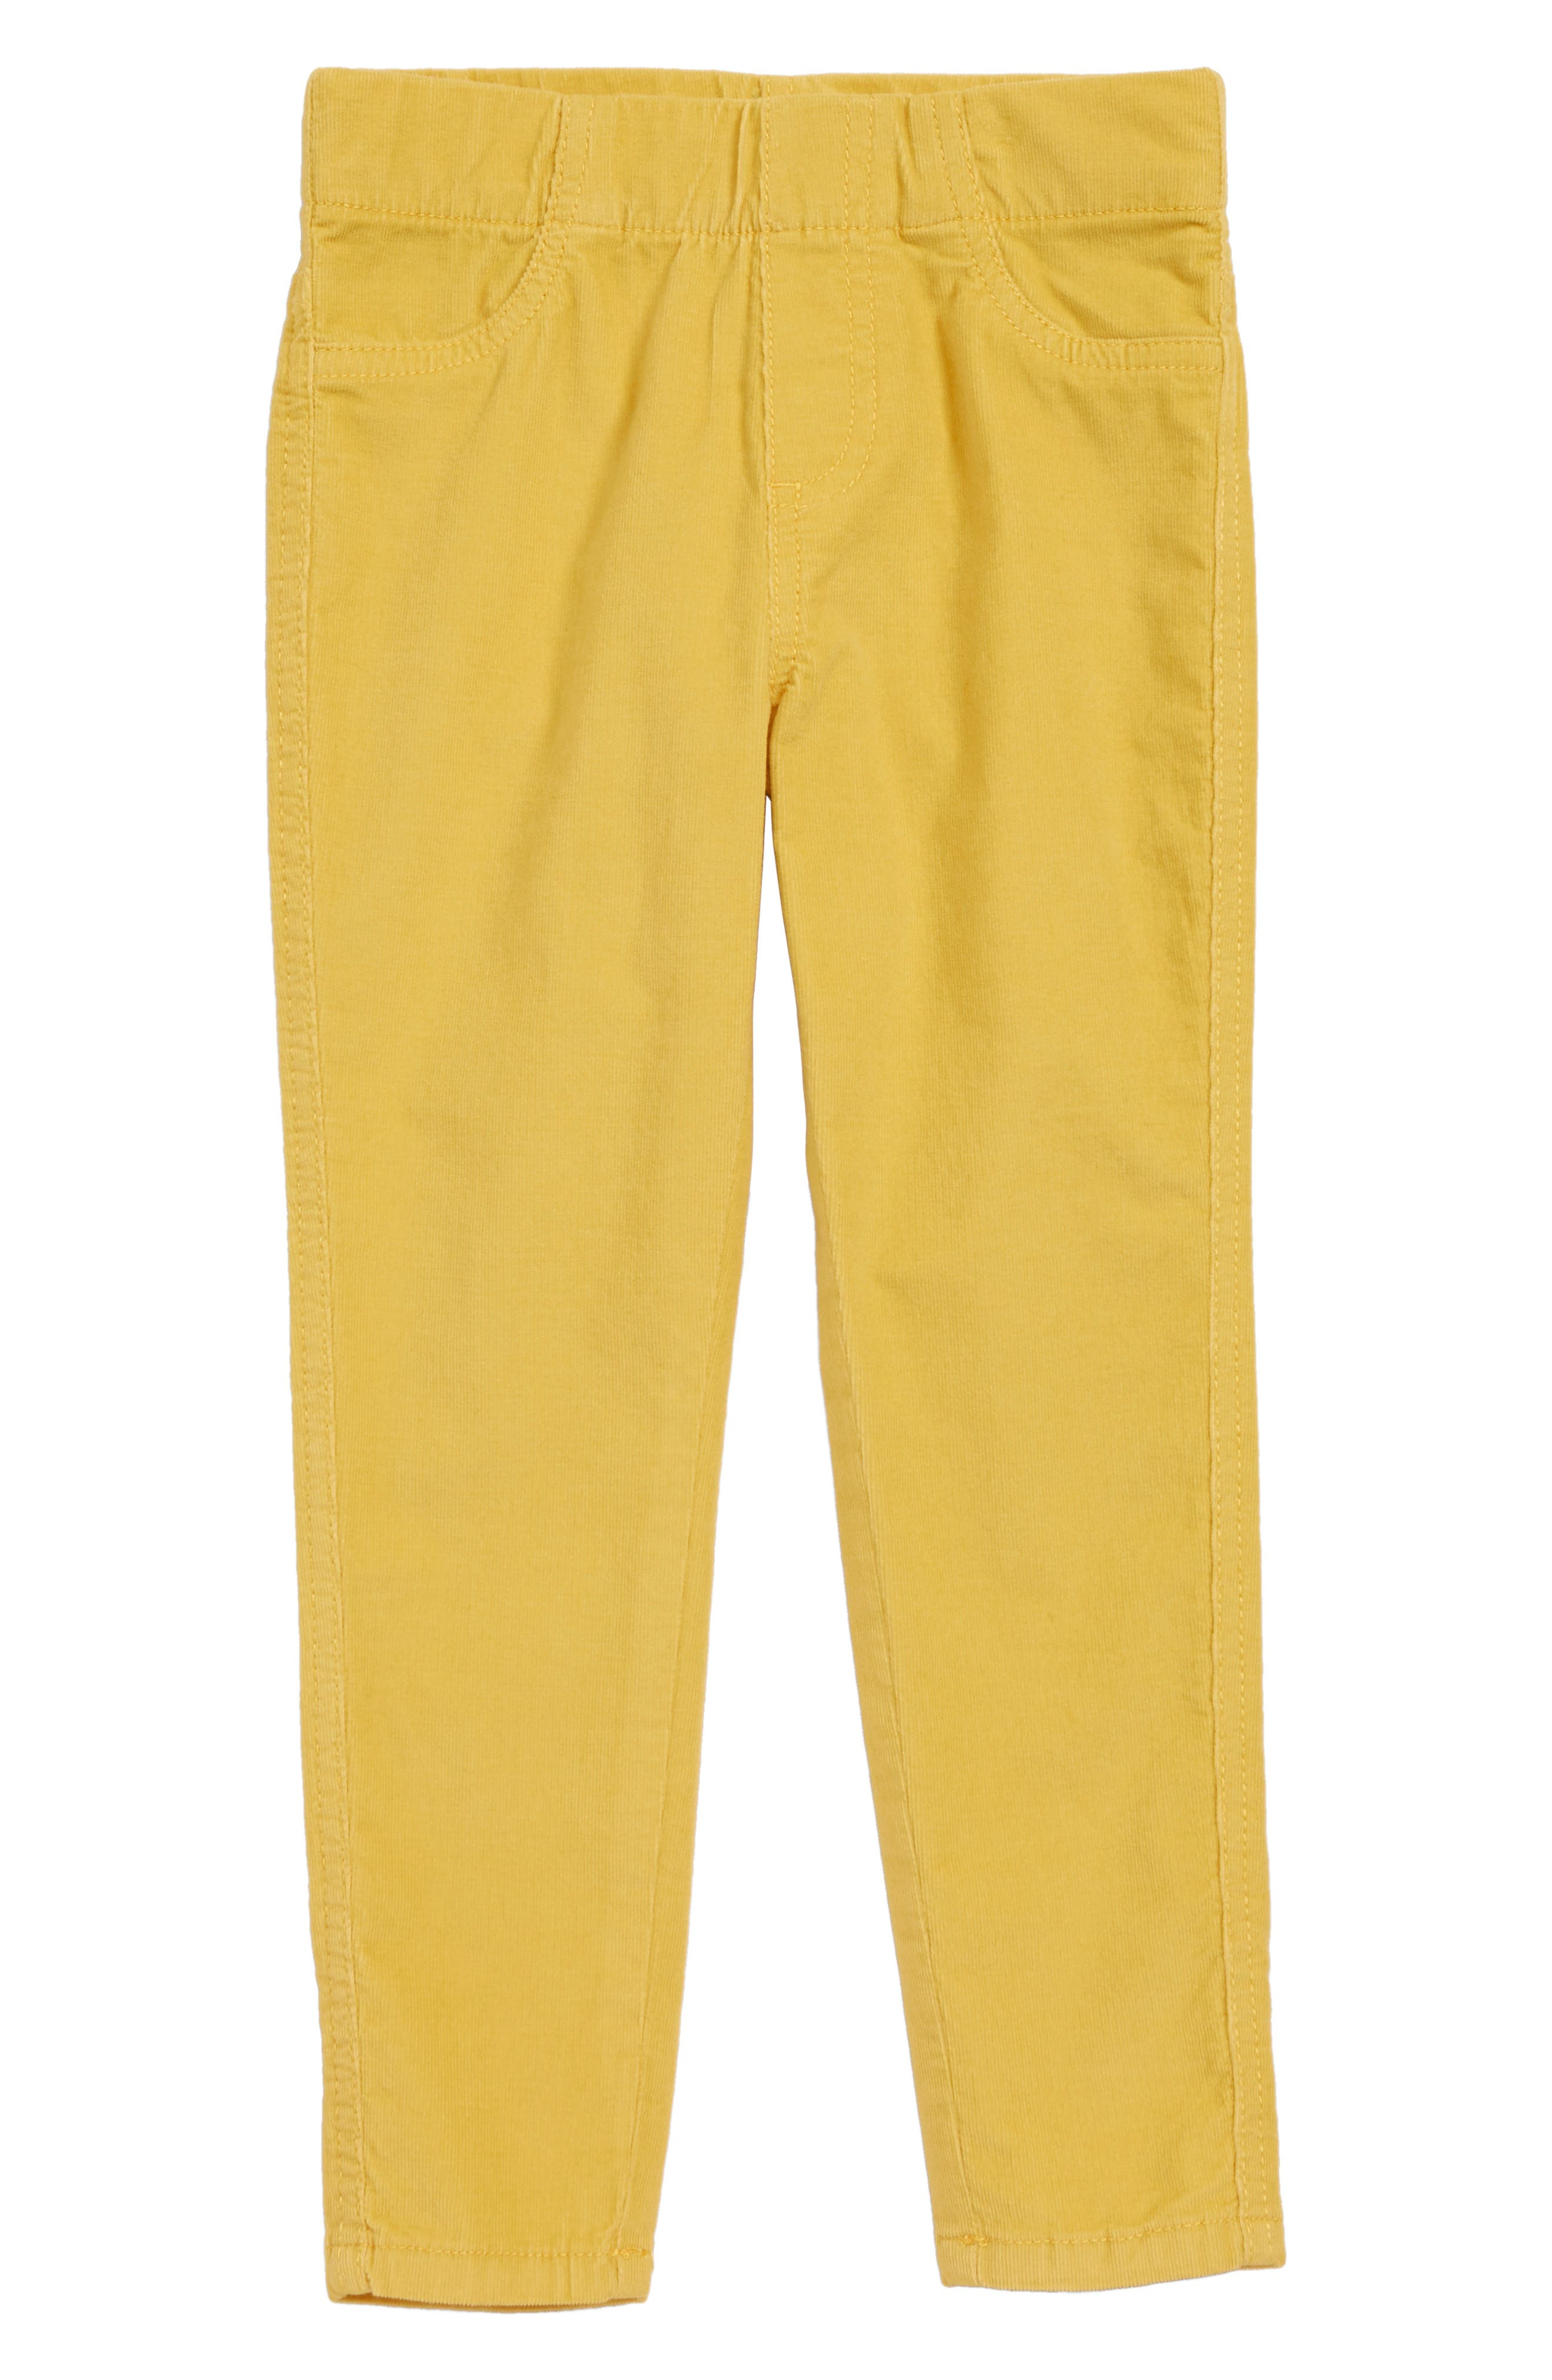 Pull-On Corduroy Pants,                             Main thumbnail 1, color,                             YELLOW FUN